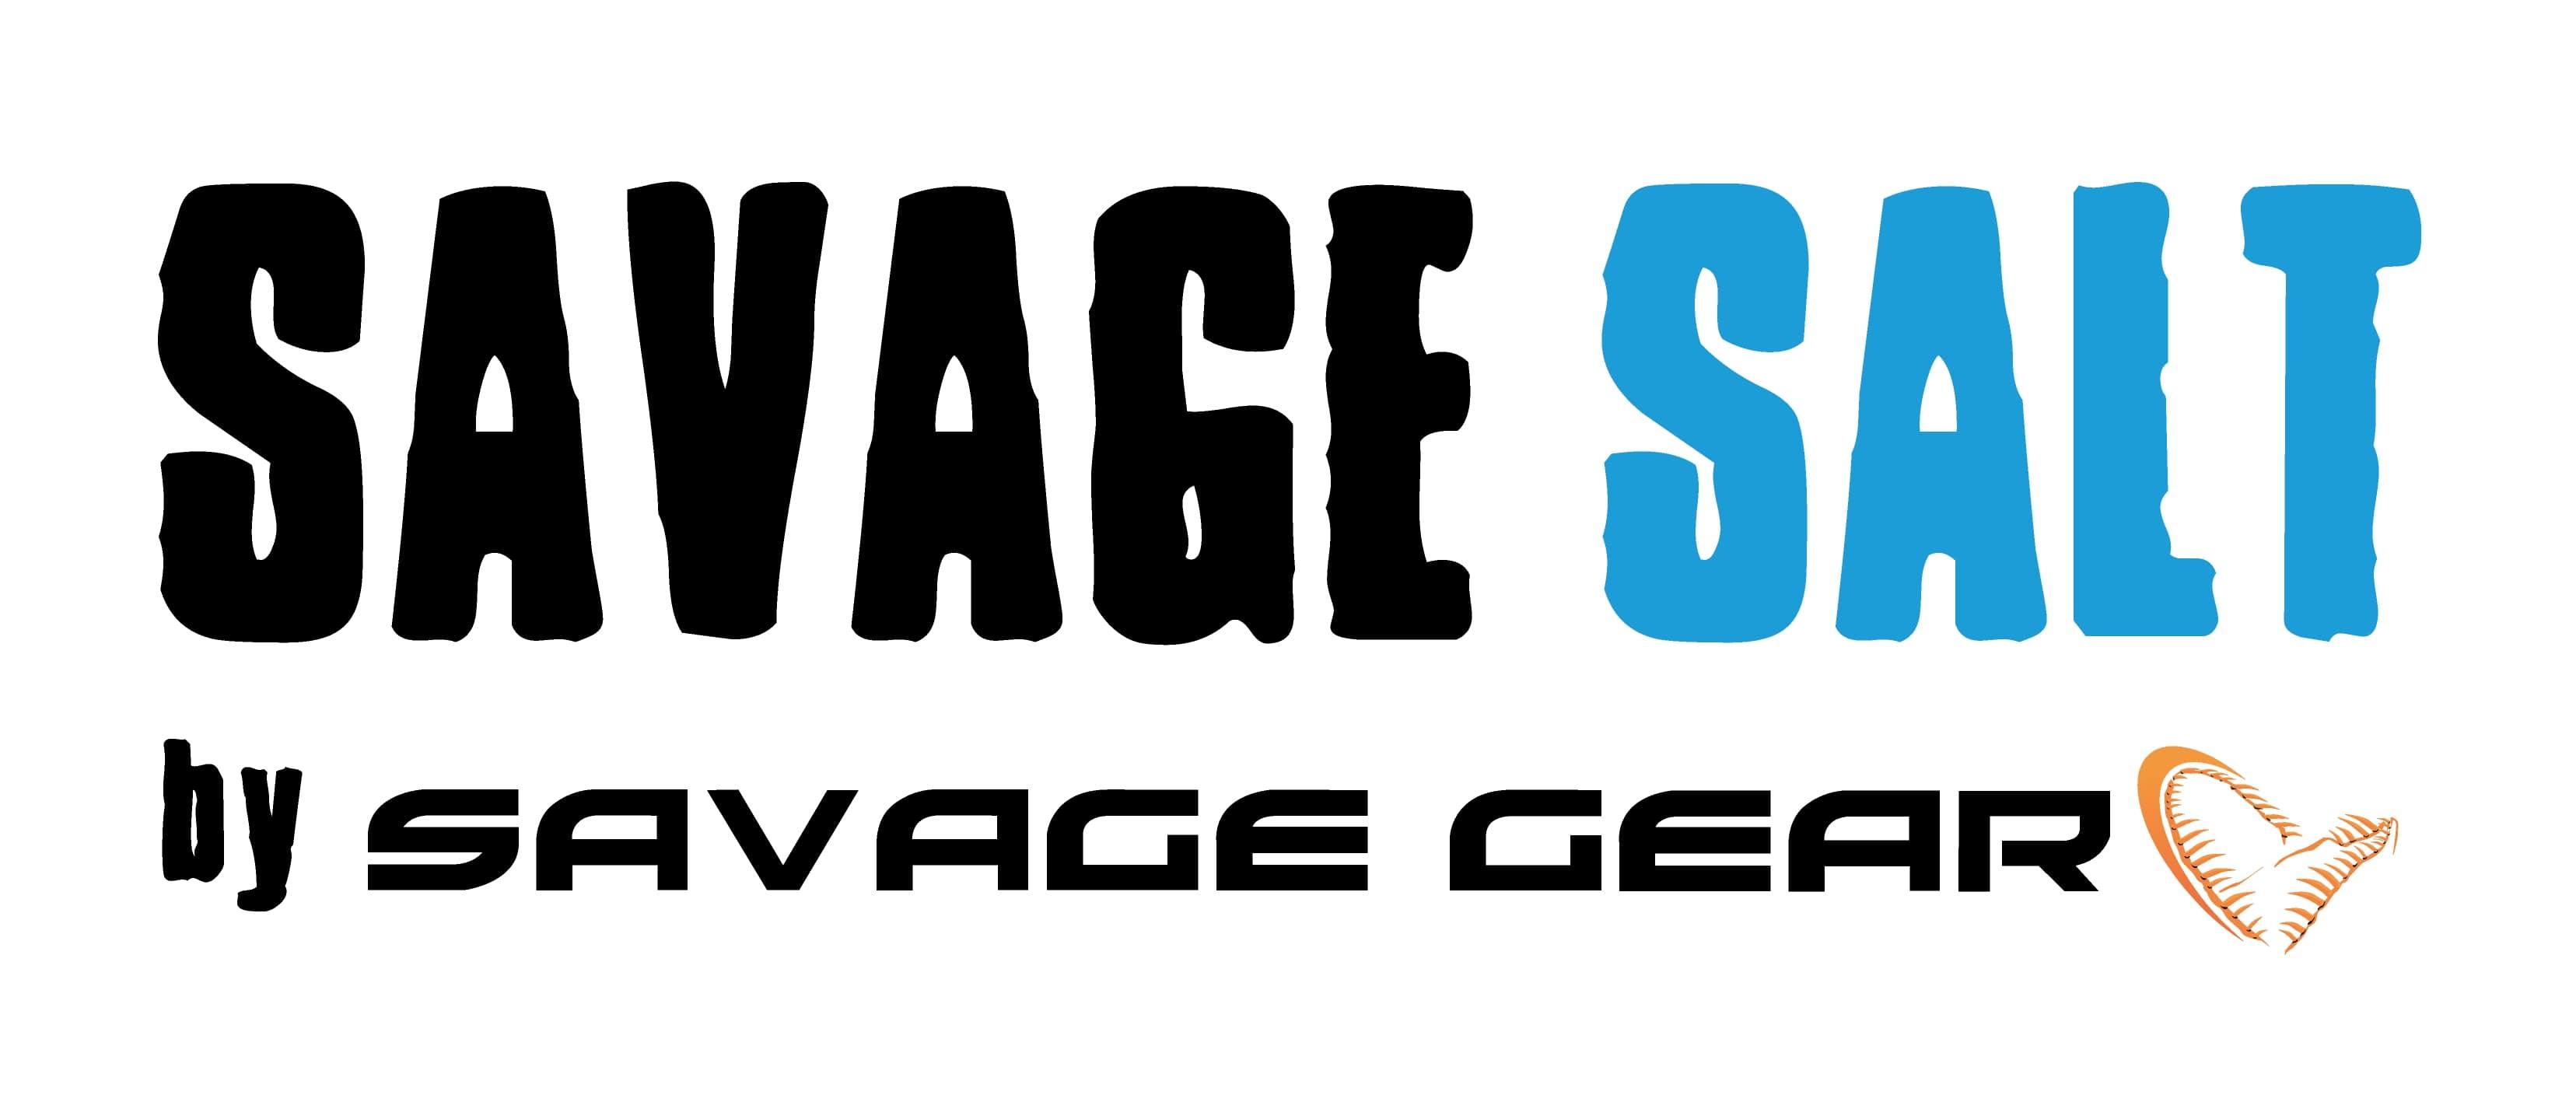 savage-gear-salt-logo-logo.jpg